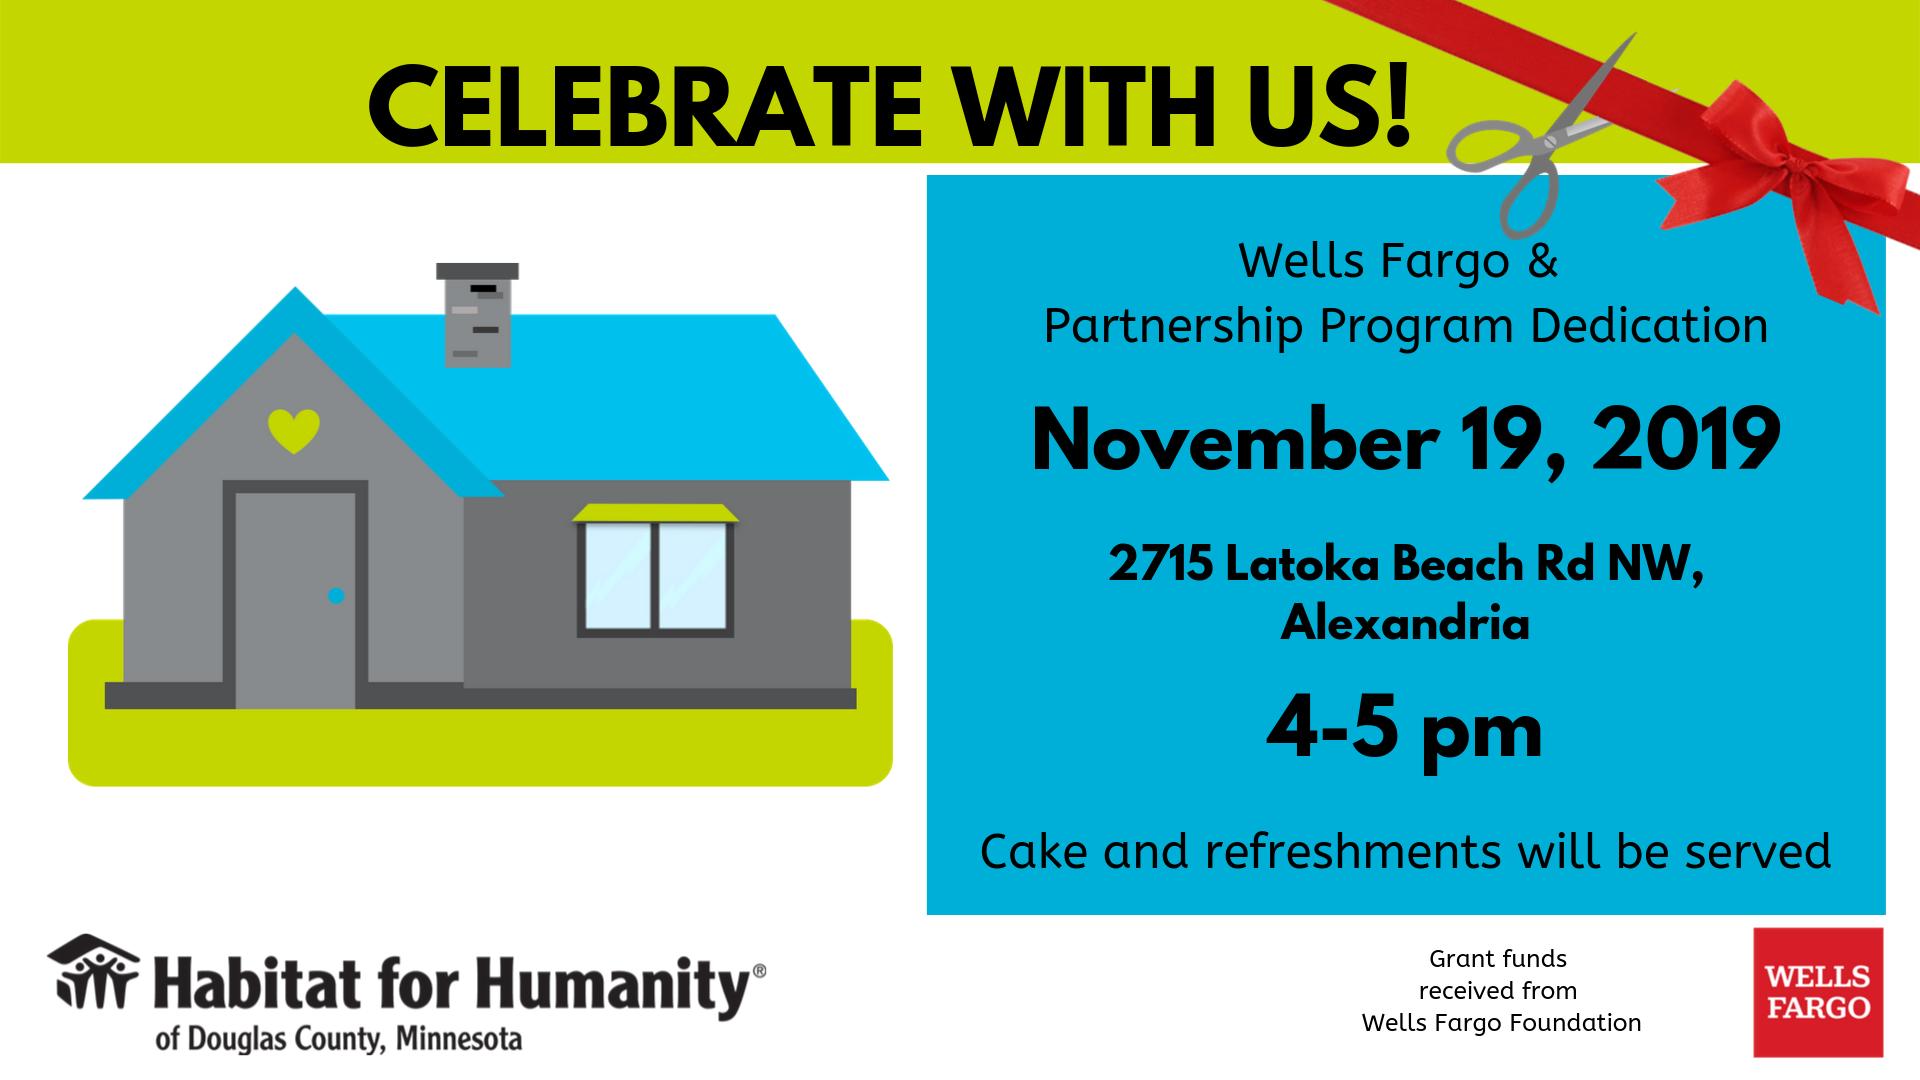 Wells Fargo, Partnership Program and Dedication